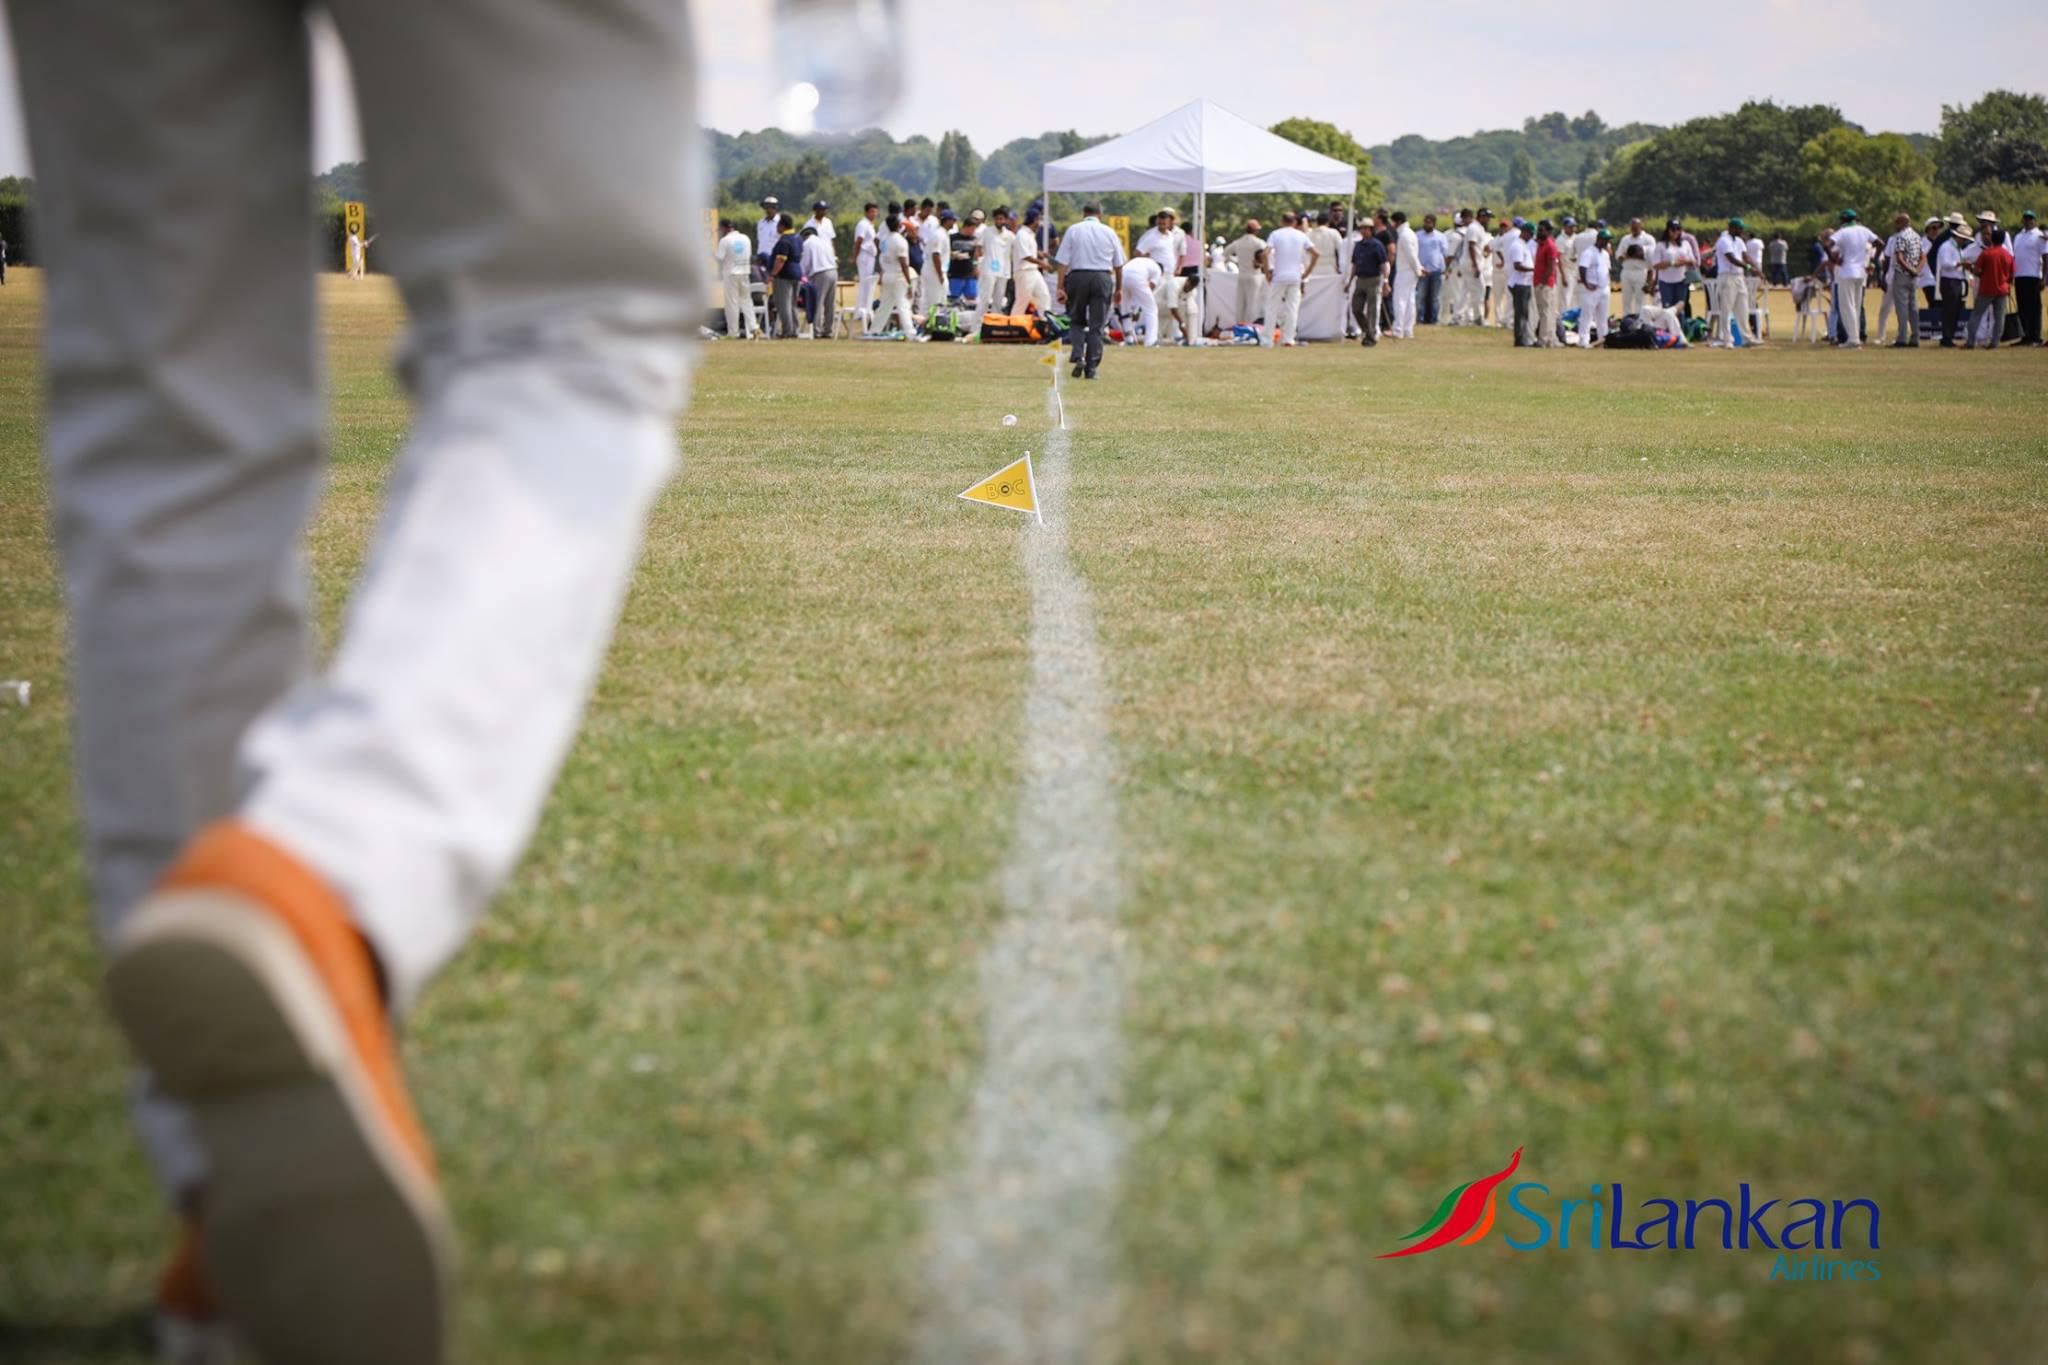 Sri-Lankan-airlines-cricket-festival-london-2017-natalia-smith--photography-31.jpg